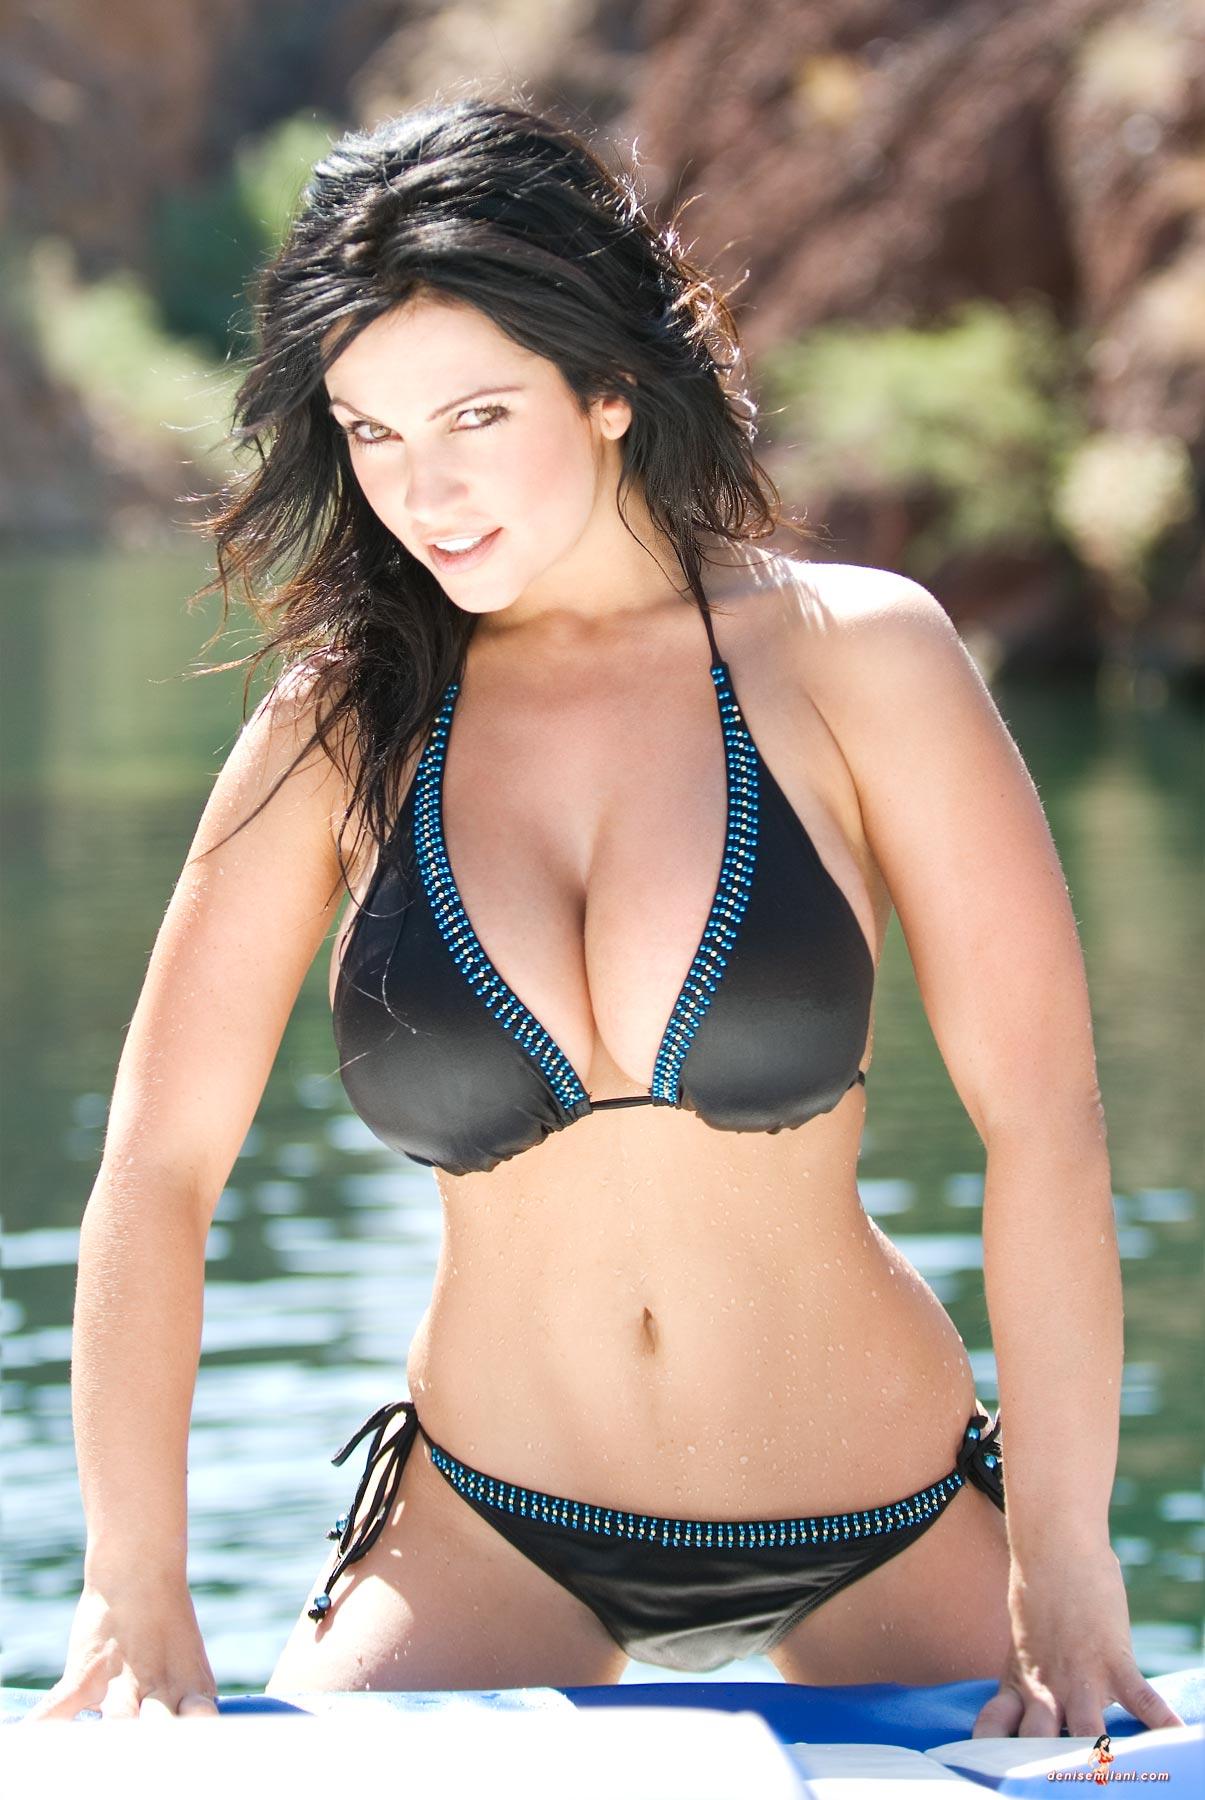 Denise Milani in her tight bikini fishing - NNConnect.com